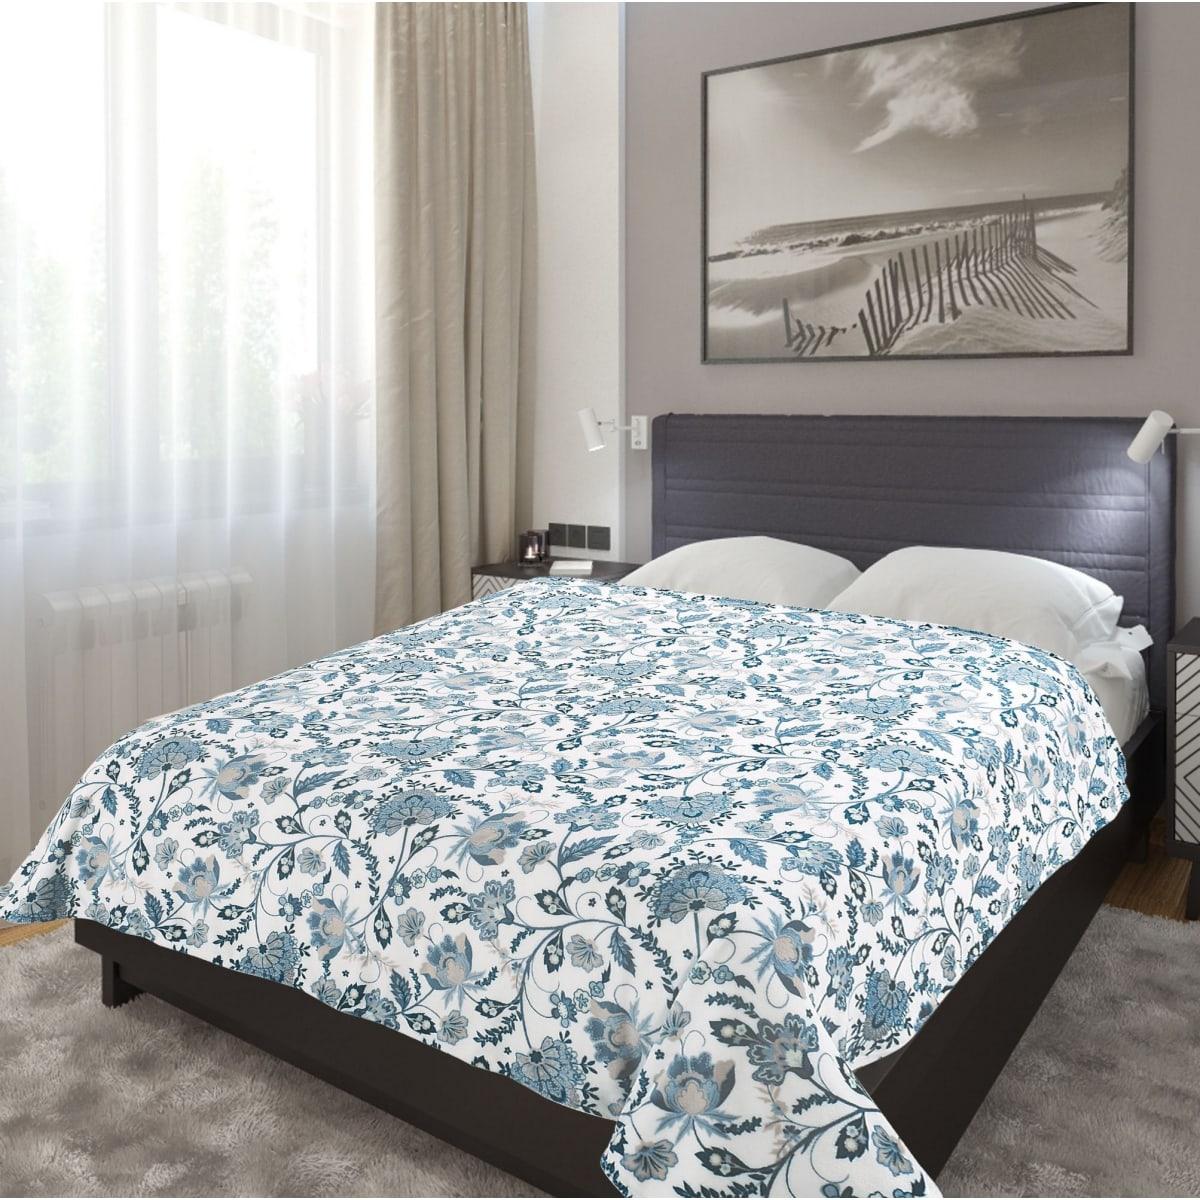 Плед TexRepublic Absolute flannel Цветы 150х200 см, фланель